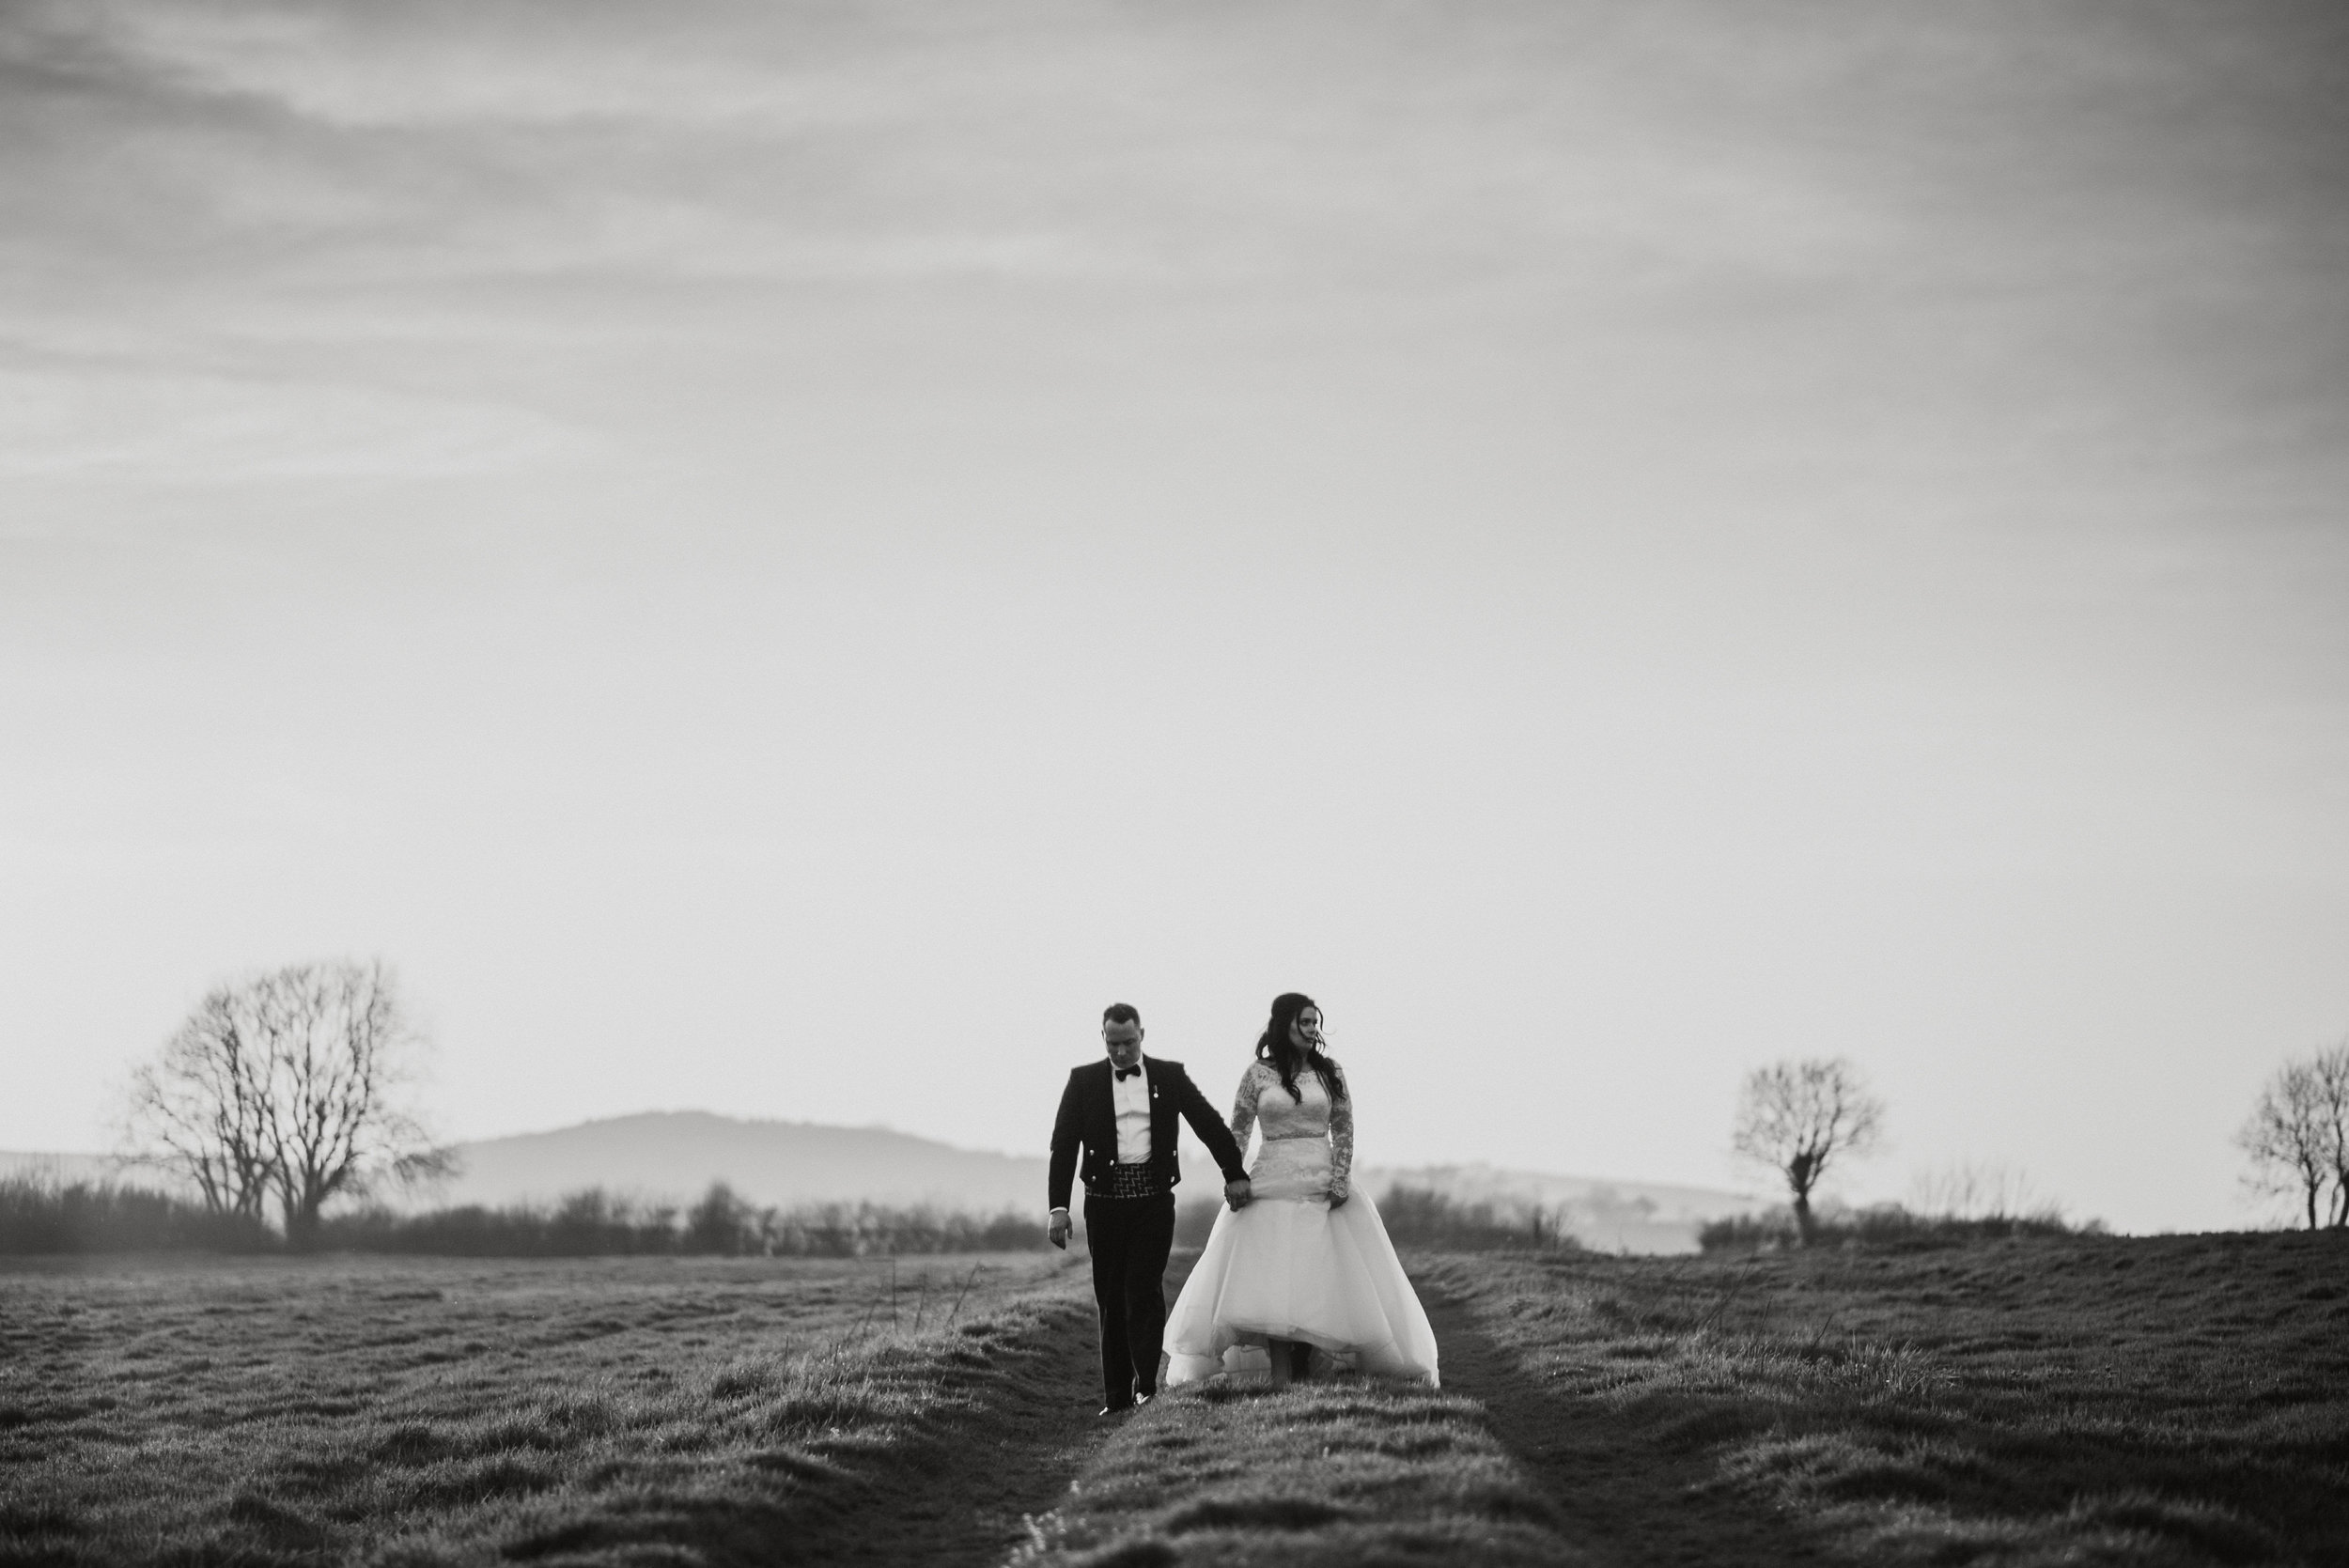 wedding-photographer-the-green-cornwall-21.jpg